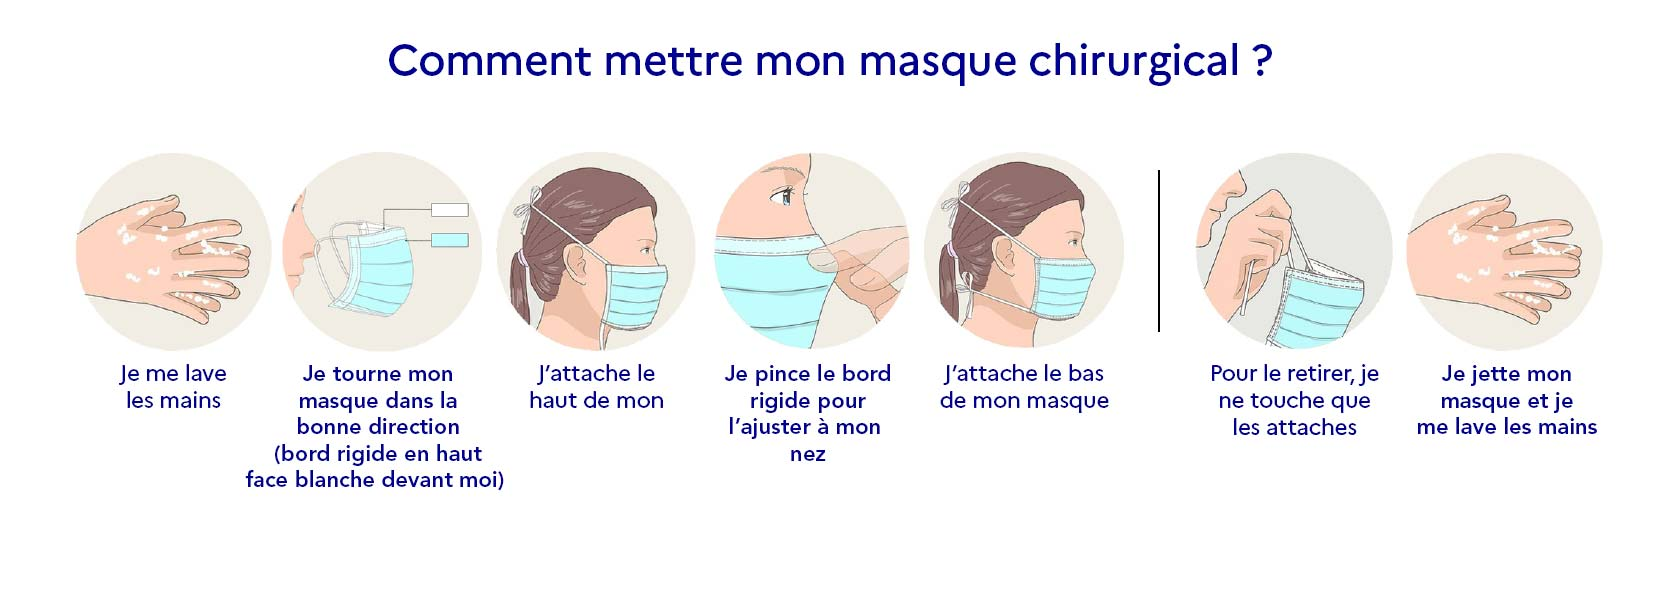 comment mettre un masque chirurgical